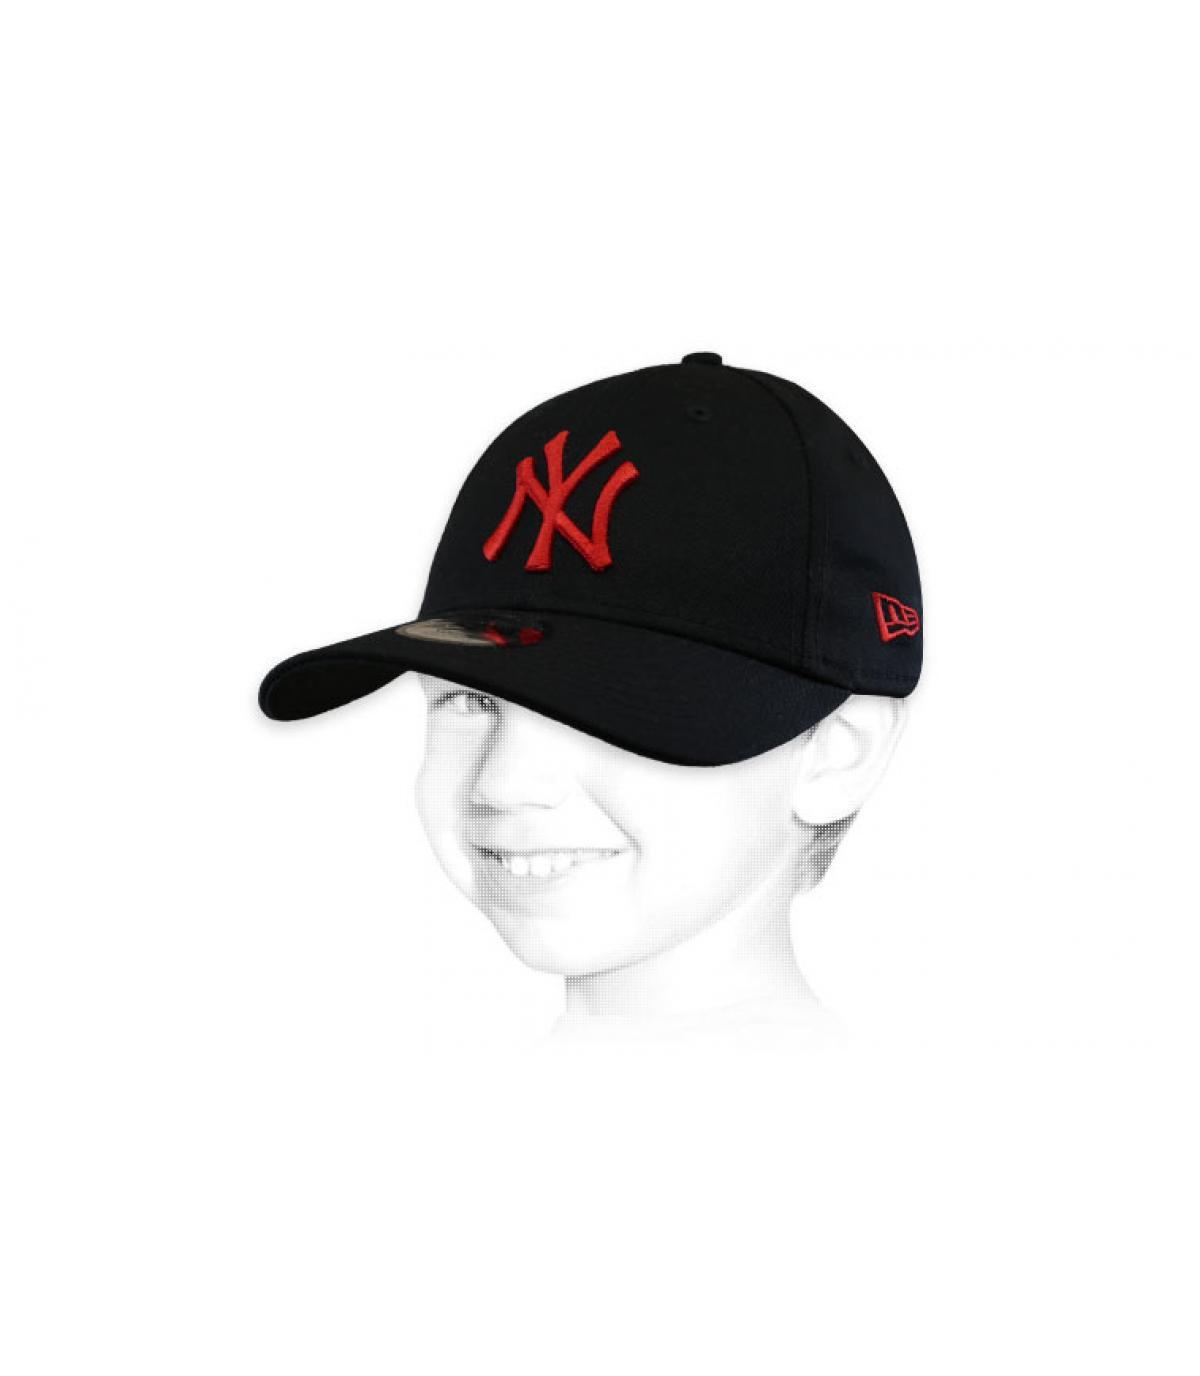 gorra infantil NY negro rojo